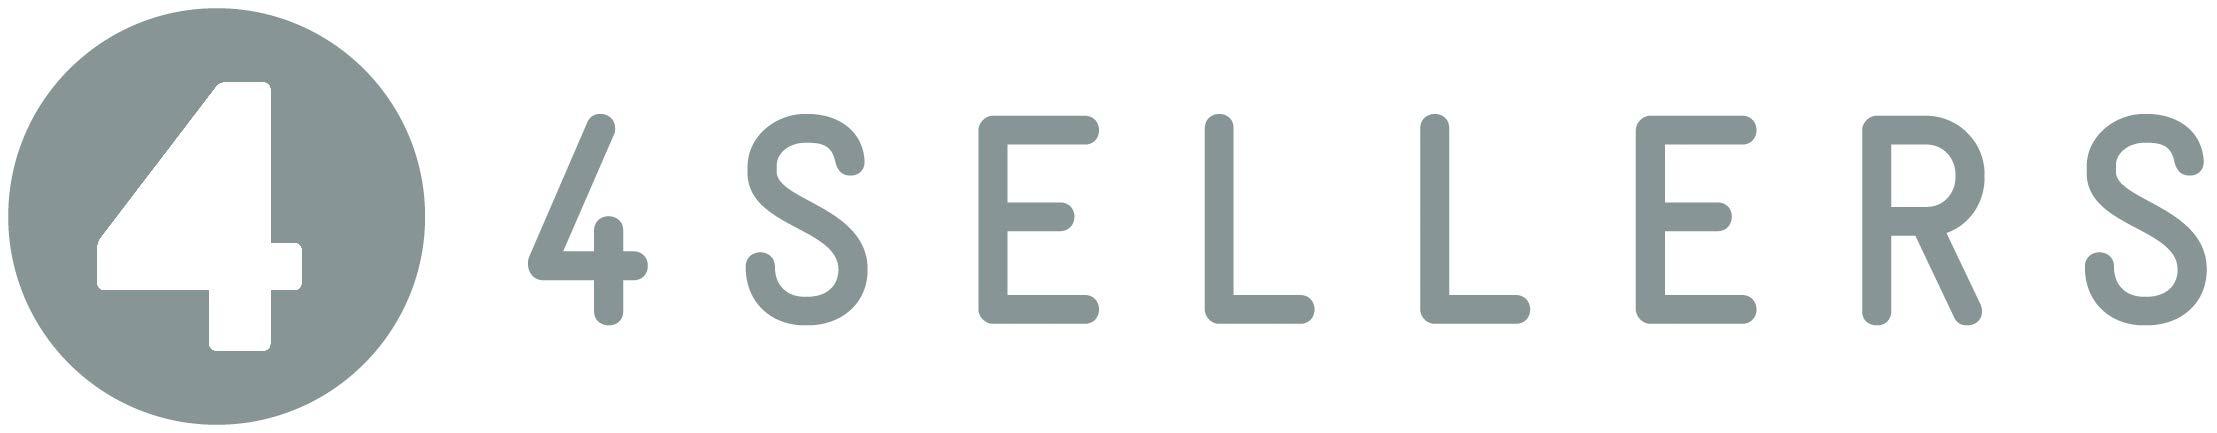 Icehawk Framework logo